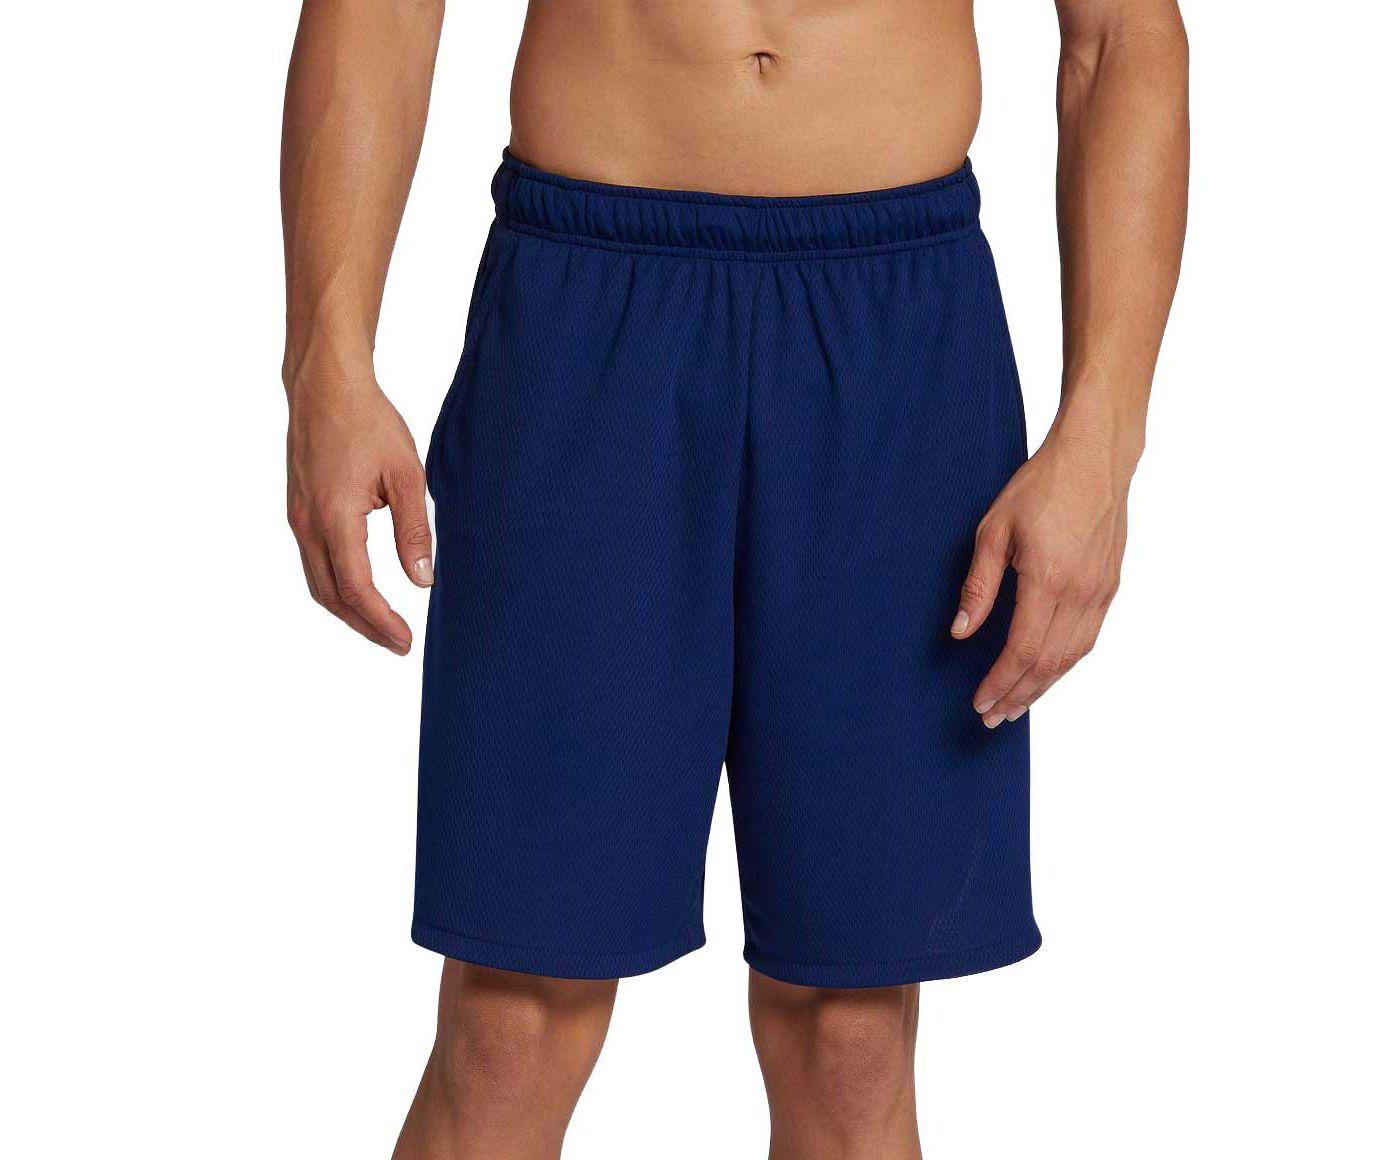 Nike Men's Dry 4.0 Training Shorts (Regular and Big & Tall)